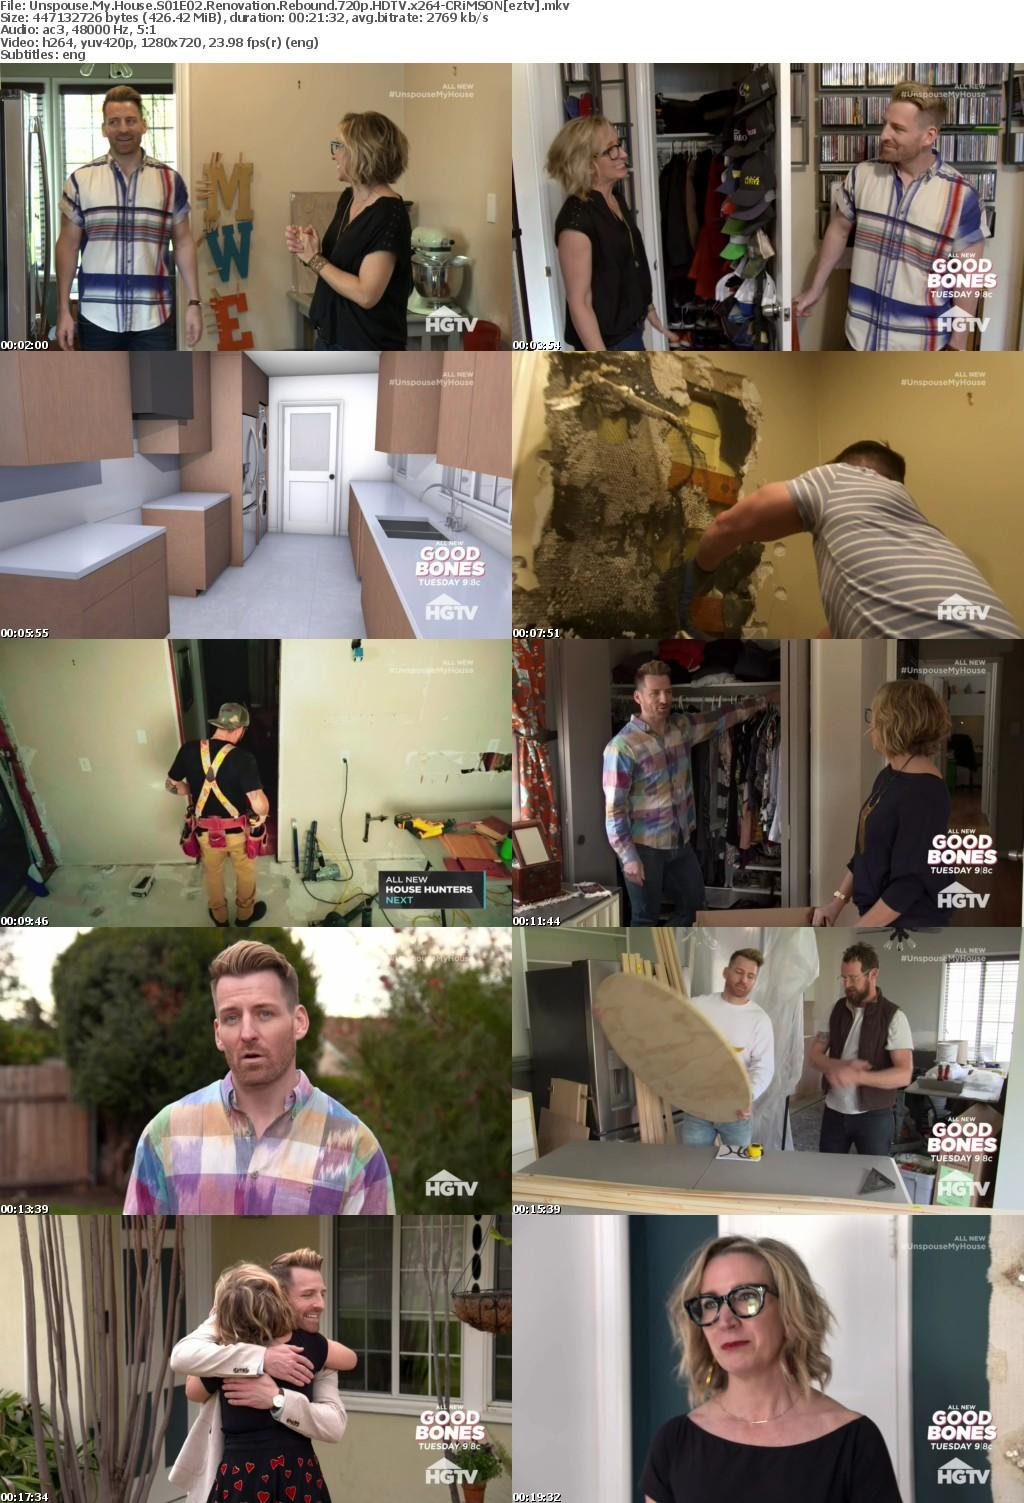 Unspouse My House S01E02 Renovation Rebound 720p HDTV x264-CRiMSON